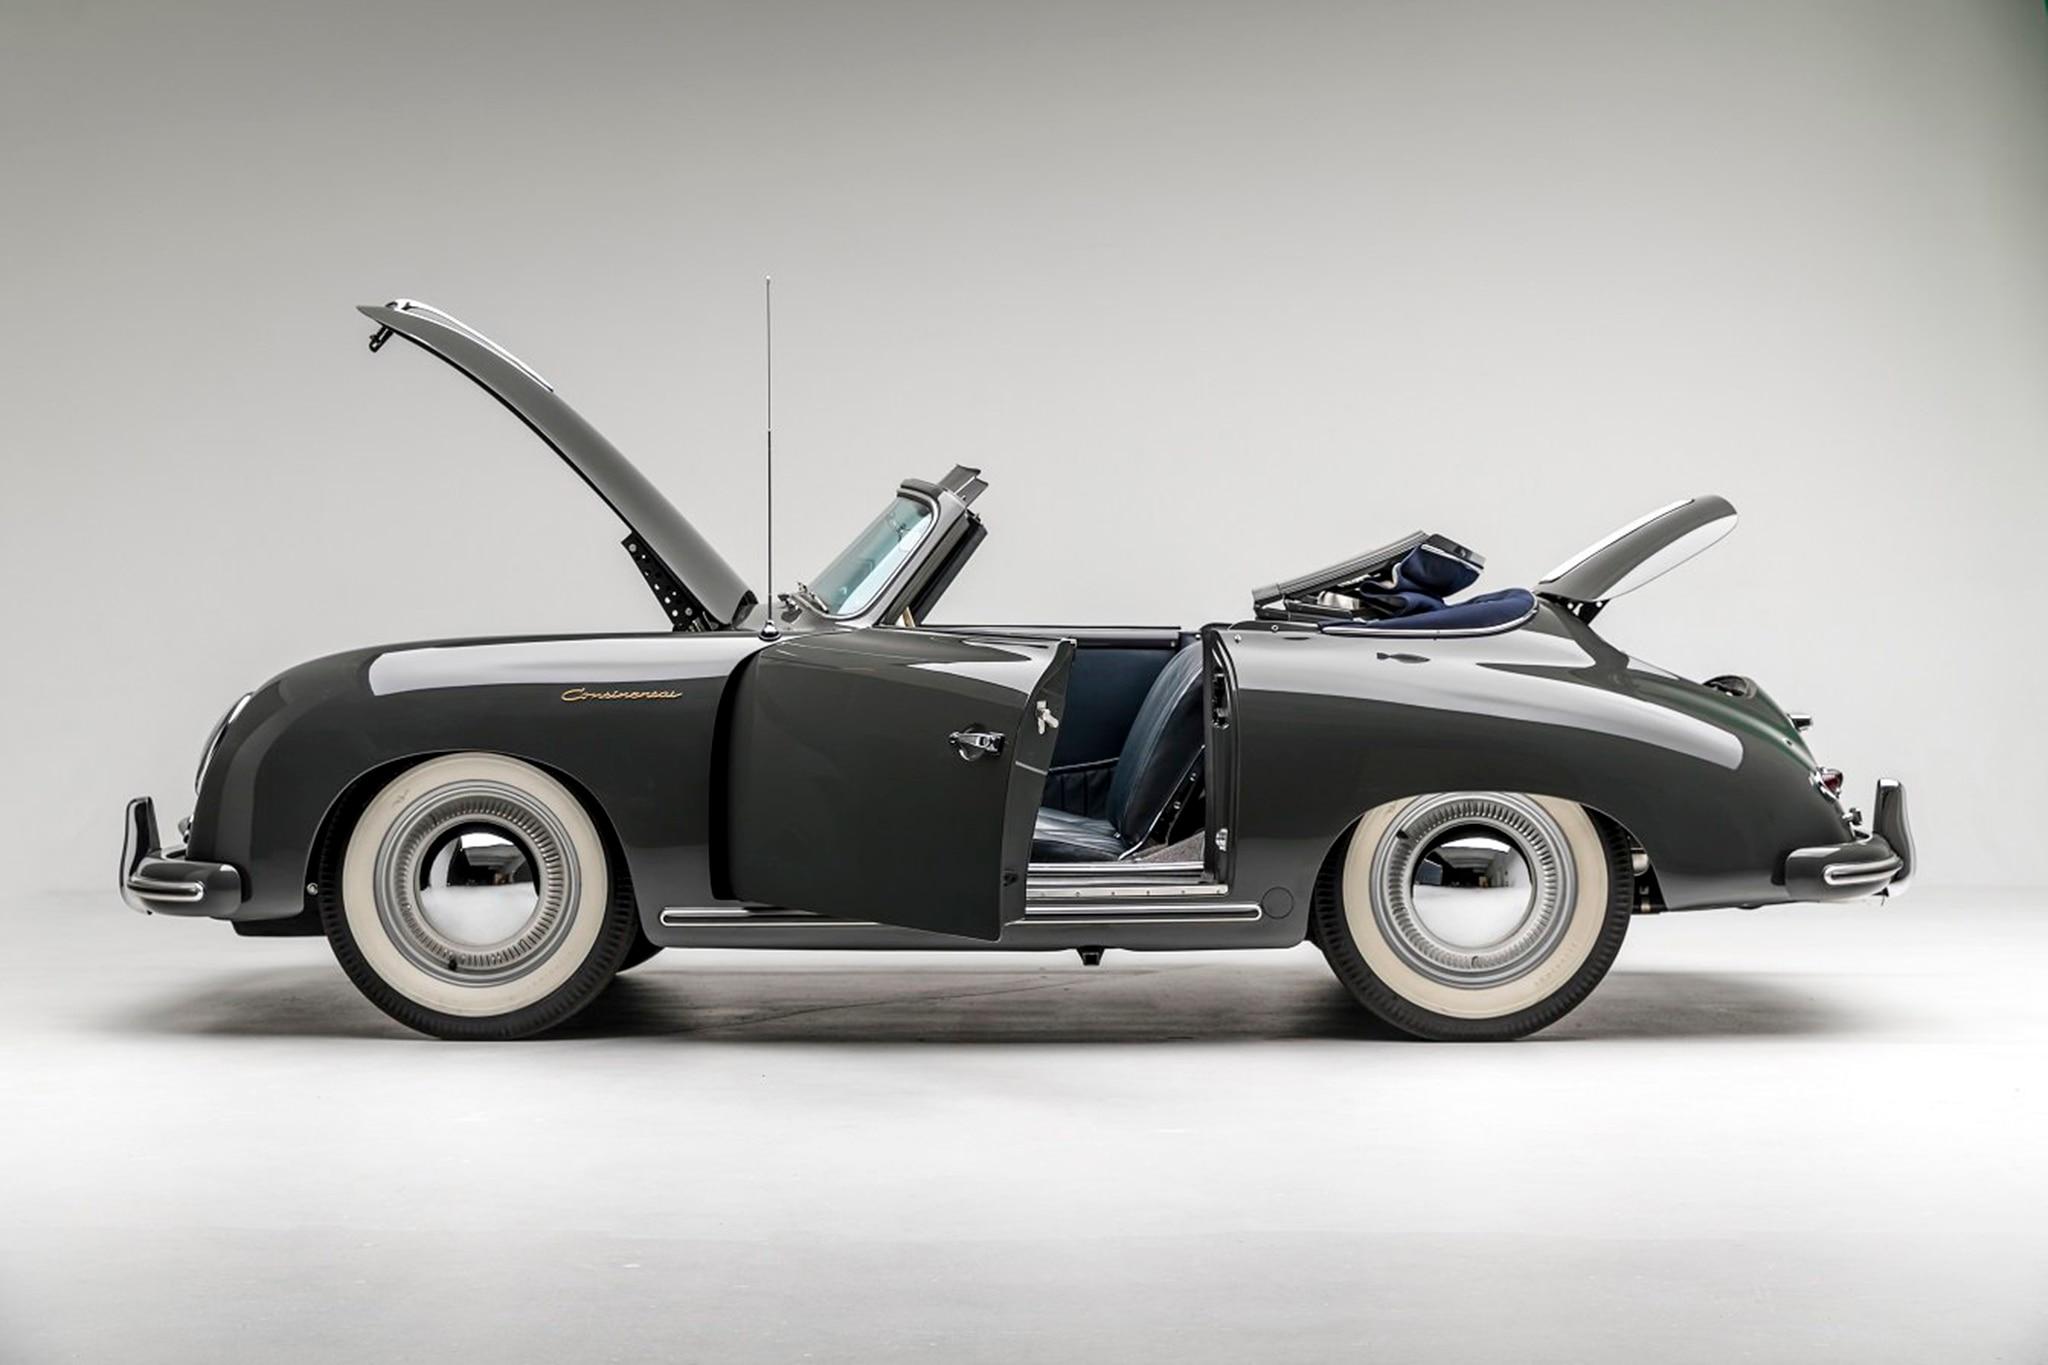 Porsche Continental Cabriolet 1955